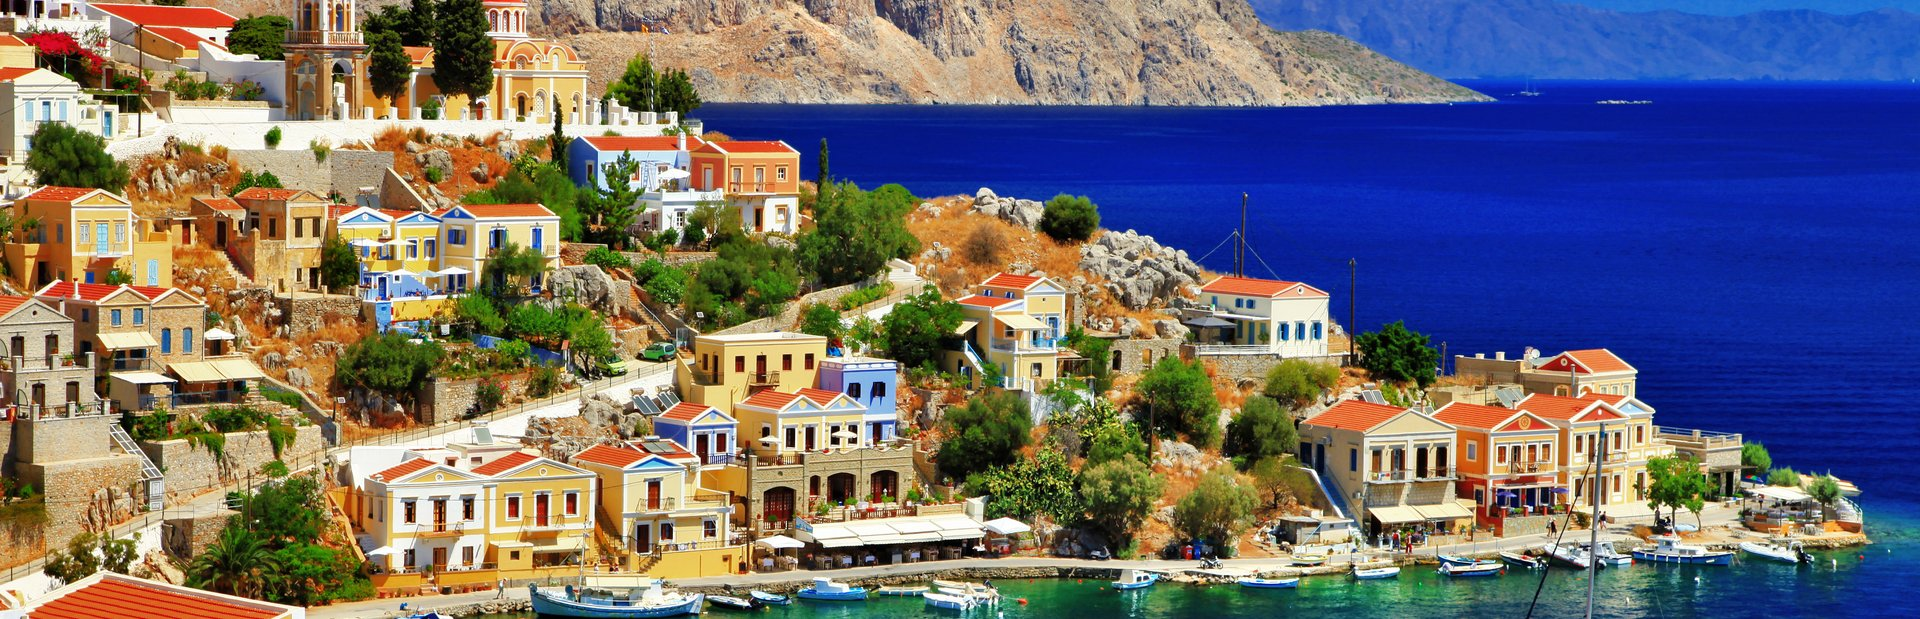 Greece climate photo